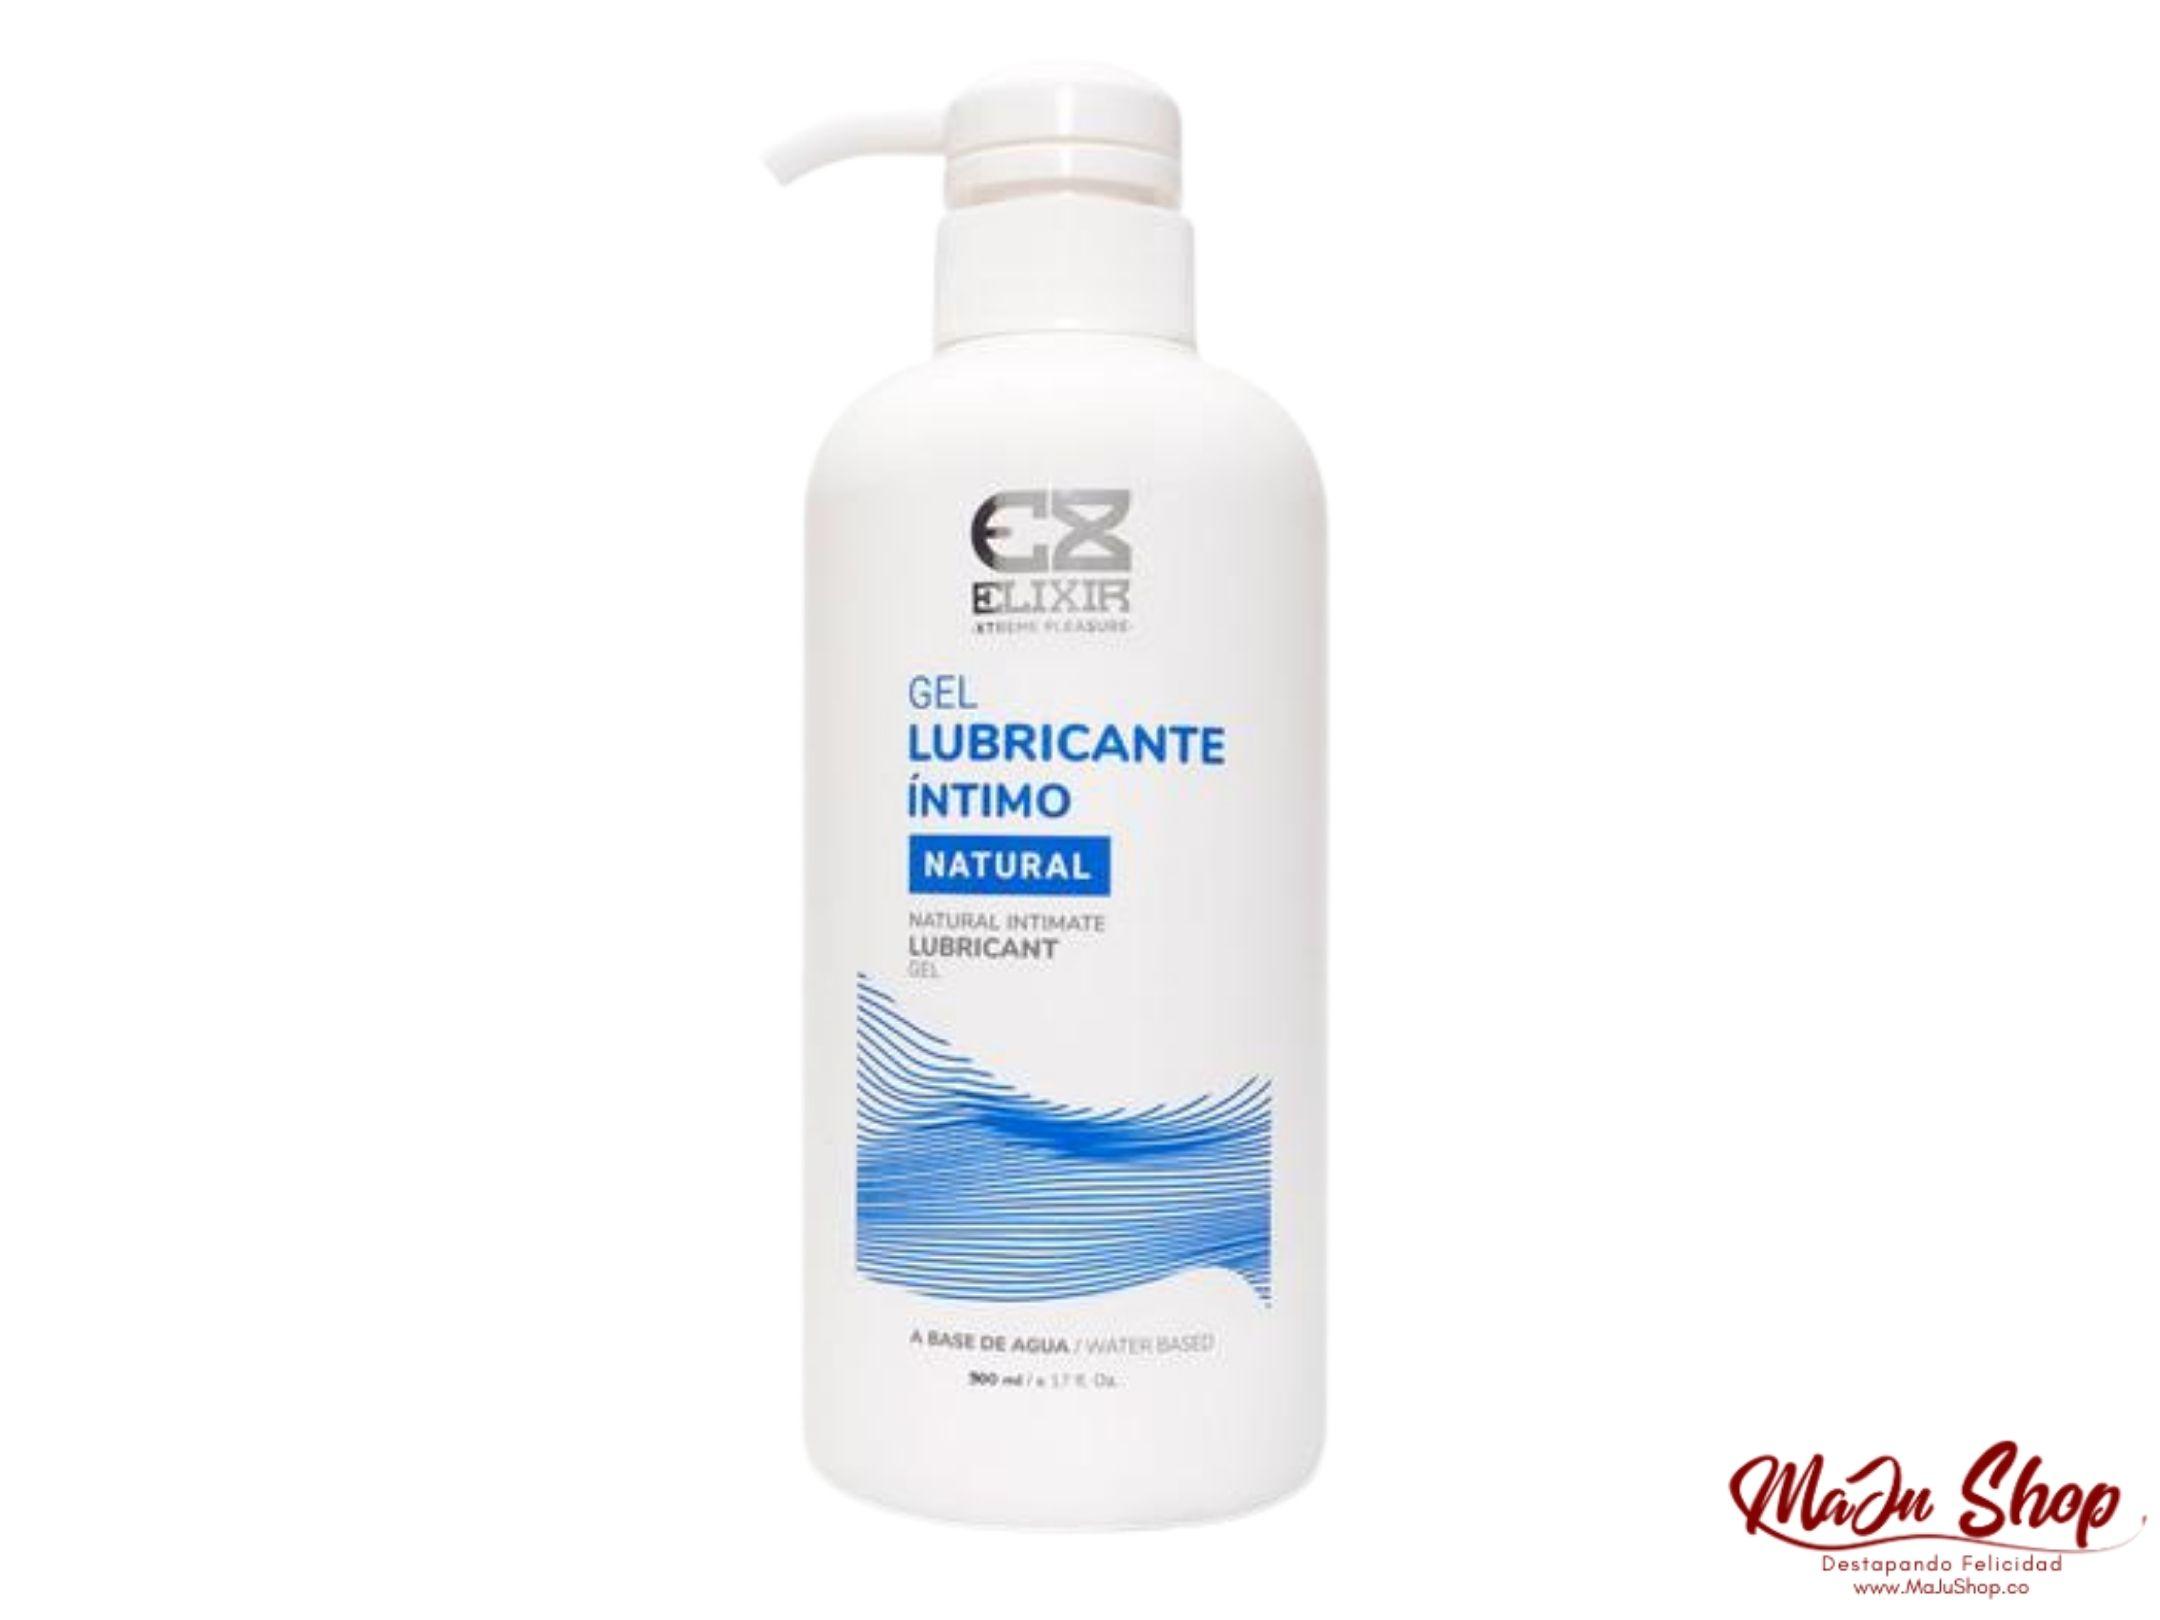 Gel-Lubricante-Intimo-Elixir